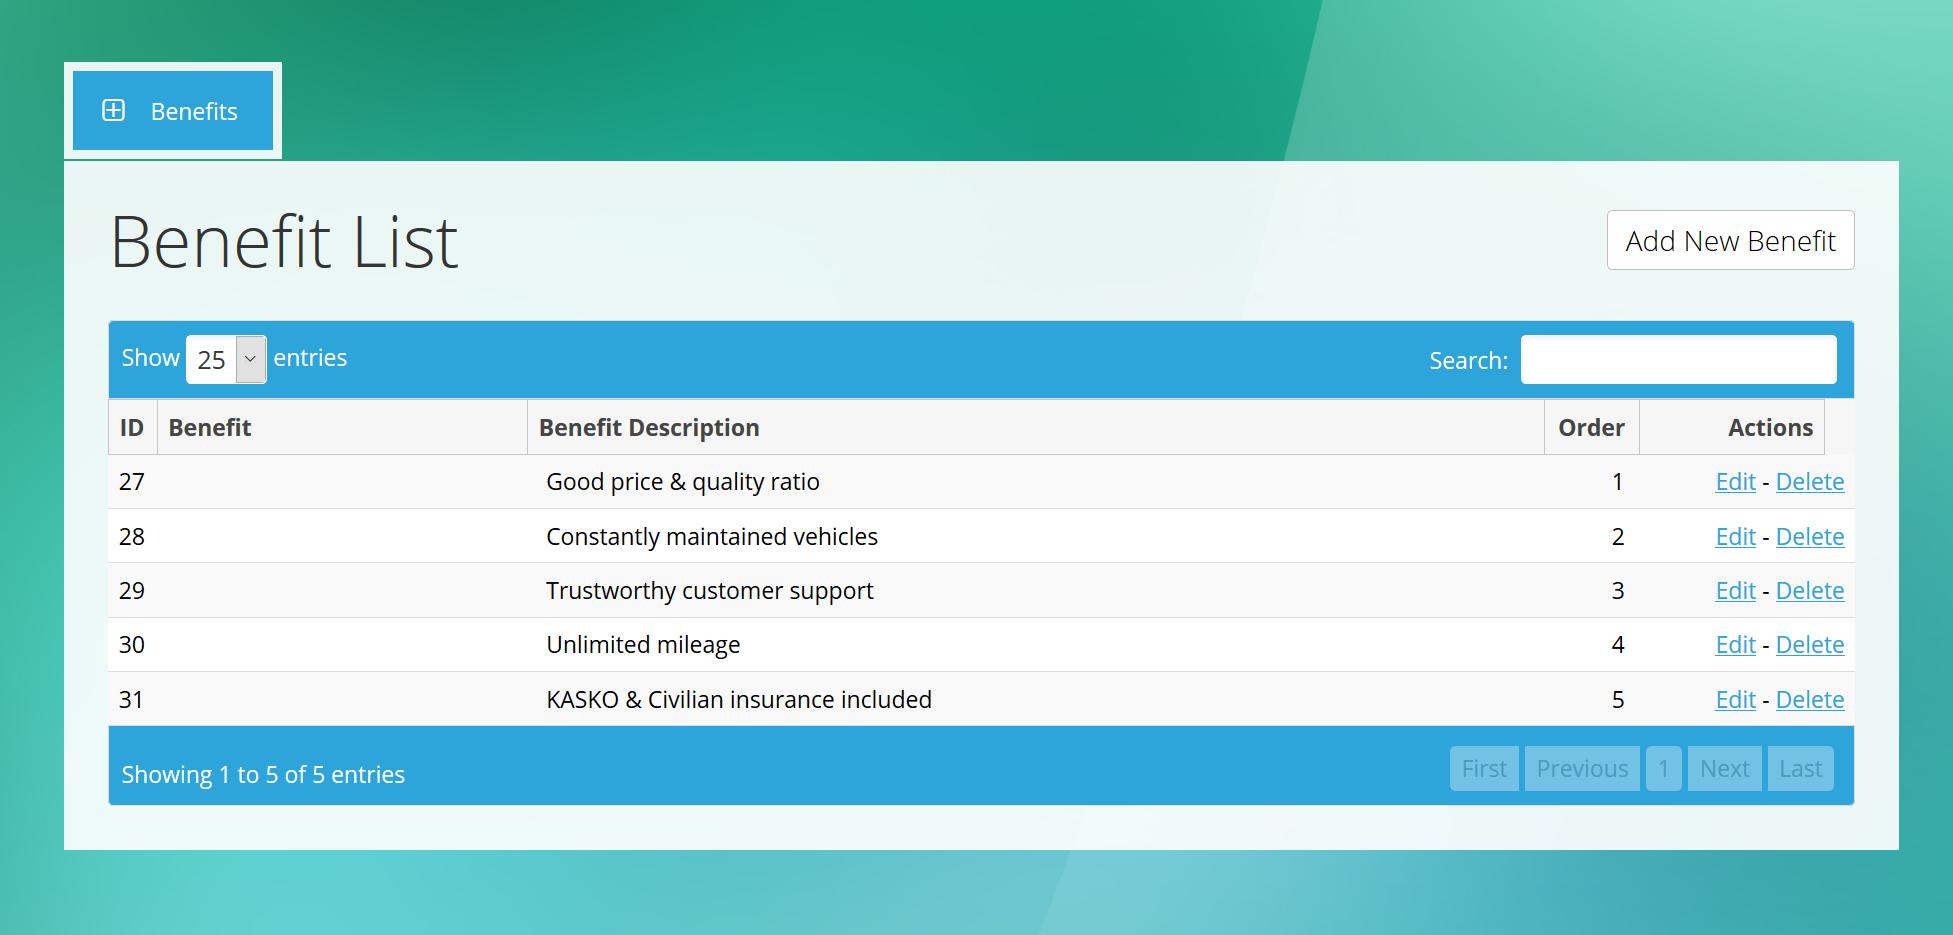 3. Benefits - Admin Benefit Manager